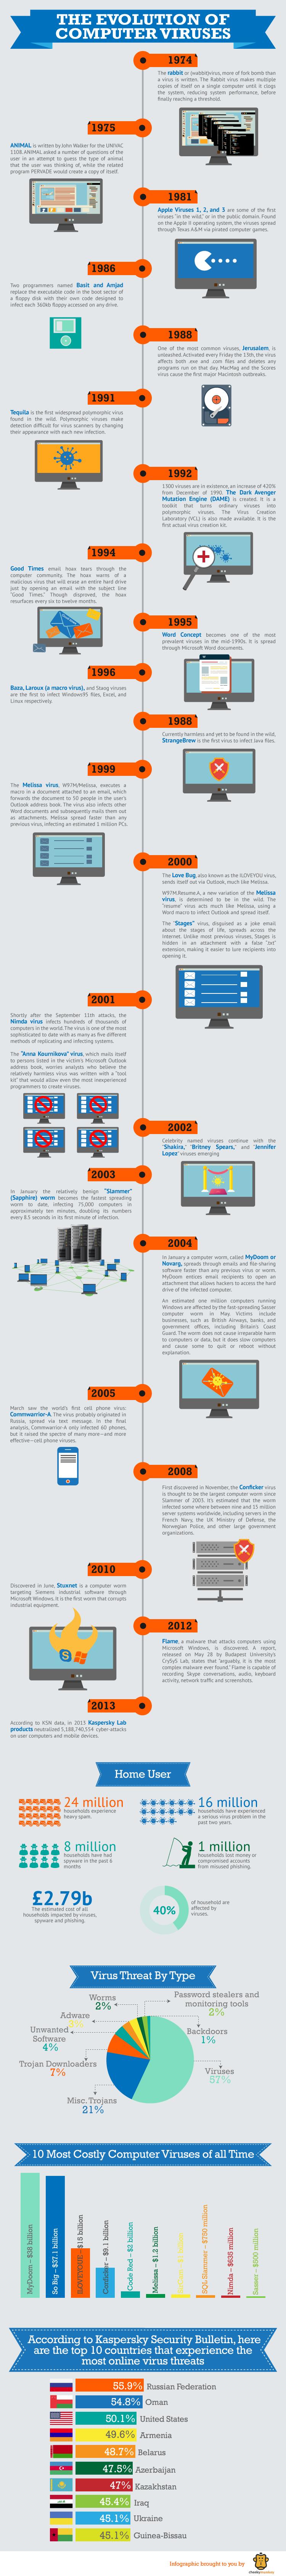 The Evolution of Computer Viruses #infographic #Computer #Viruses #History